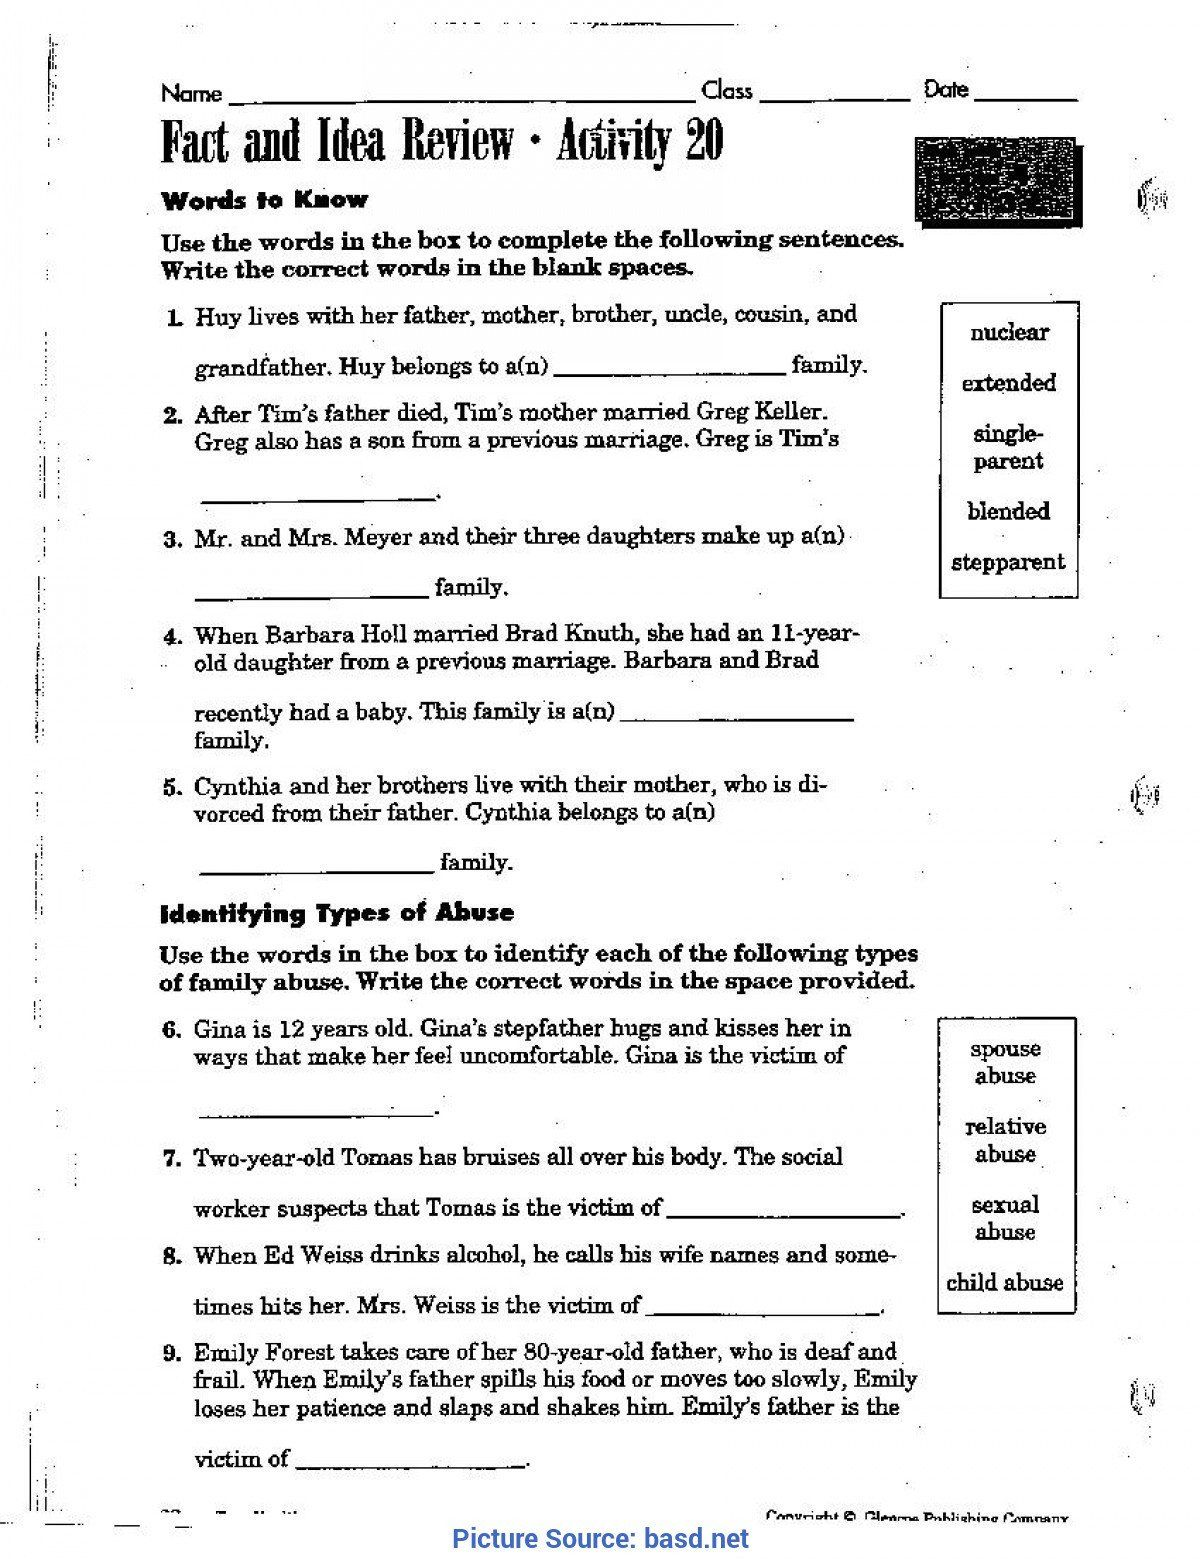 3rd Grade Health Worksheets Plex 3rd Grade Health Lesson